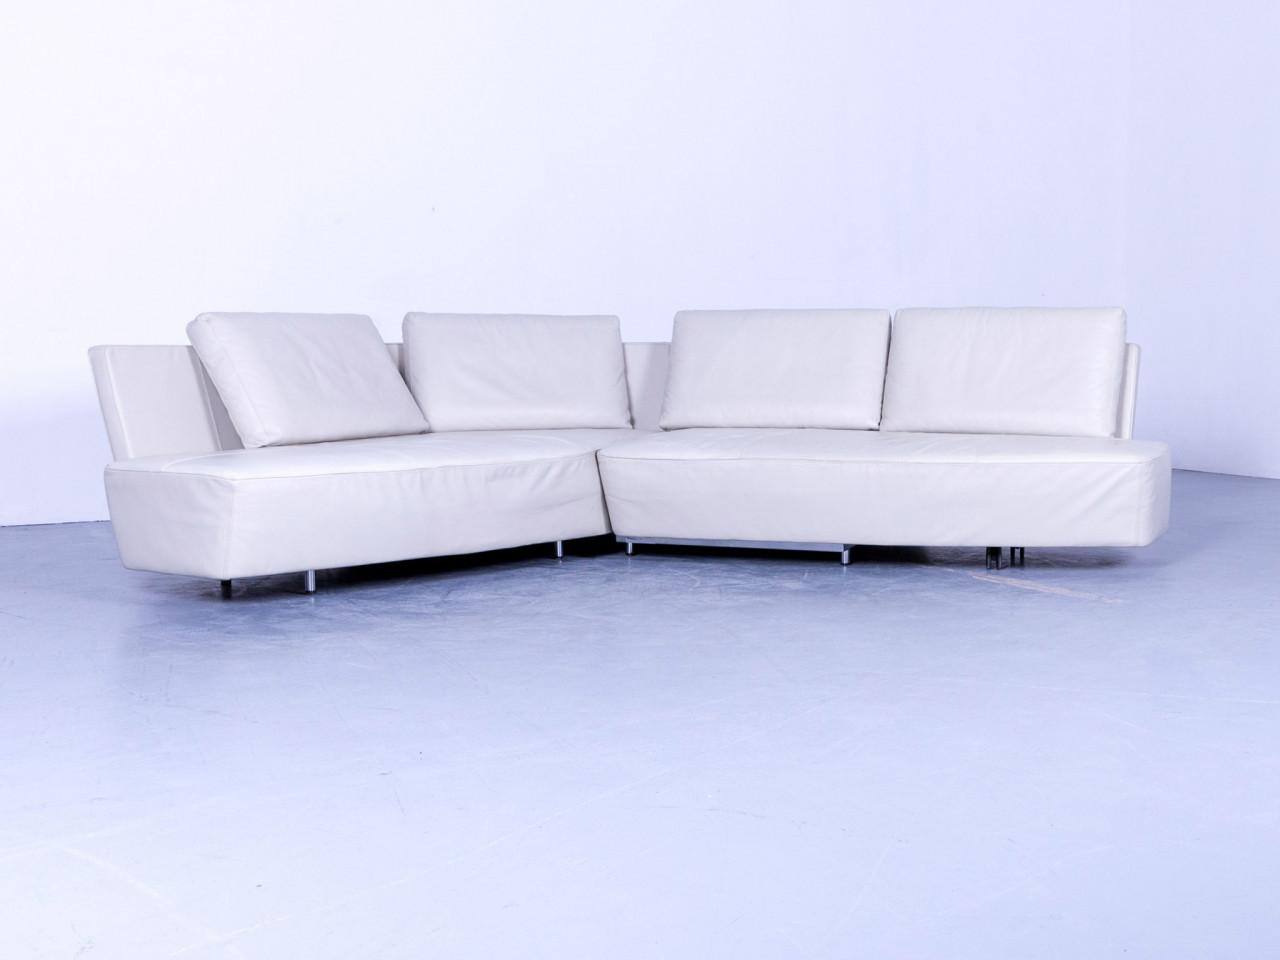 Walter Knoll Drift Designer Leder Eck Sofa Weiß Couch Funktion ...